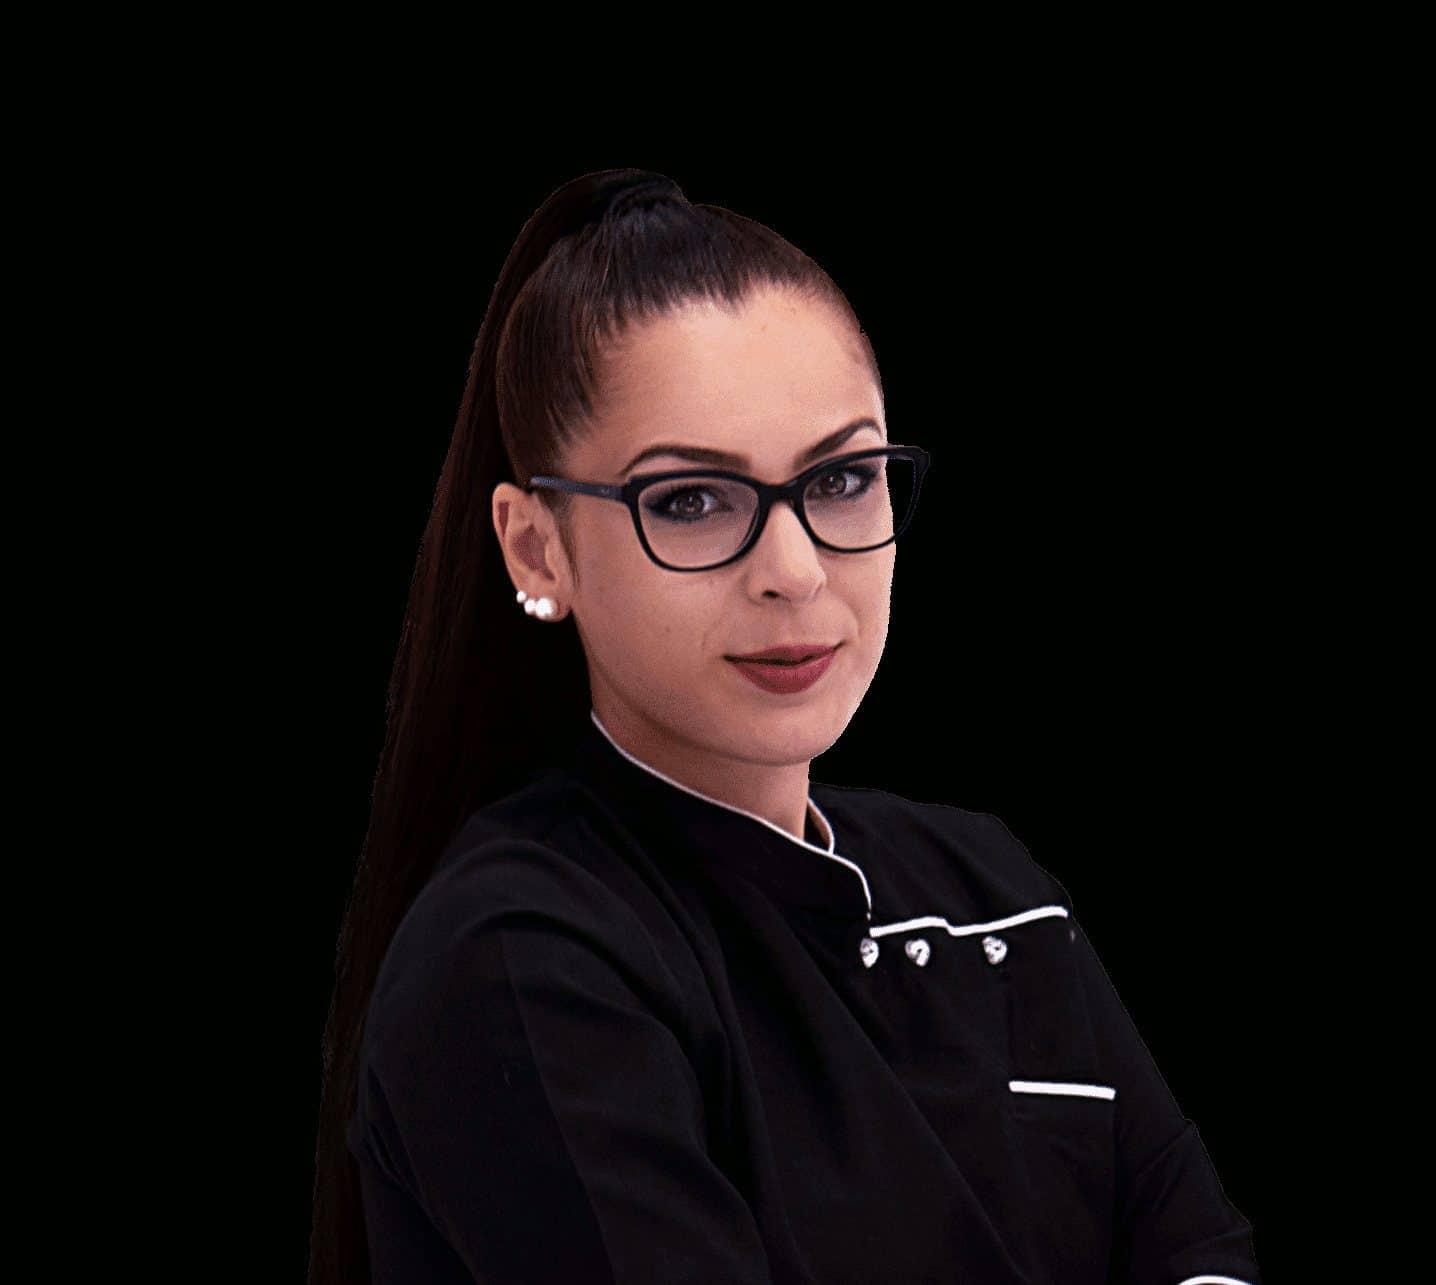 Д-р Яна Мохаммад-Бялева